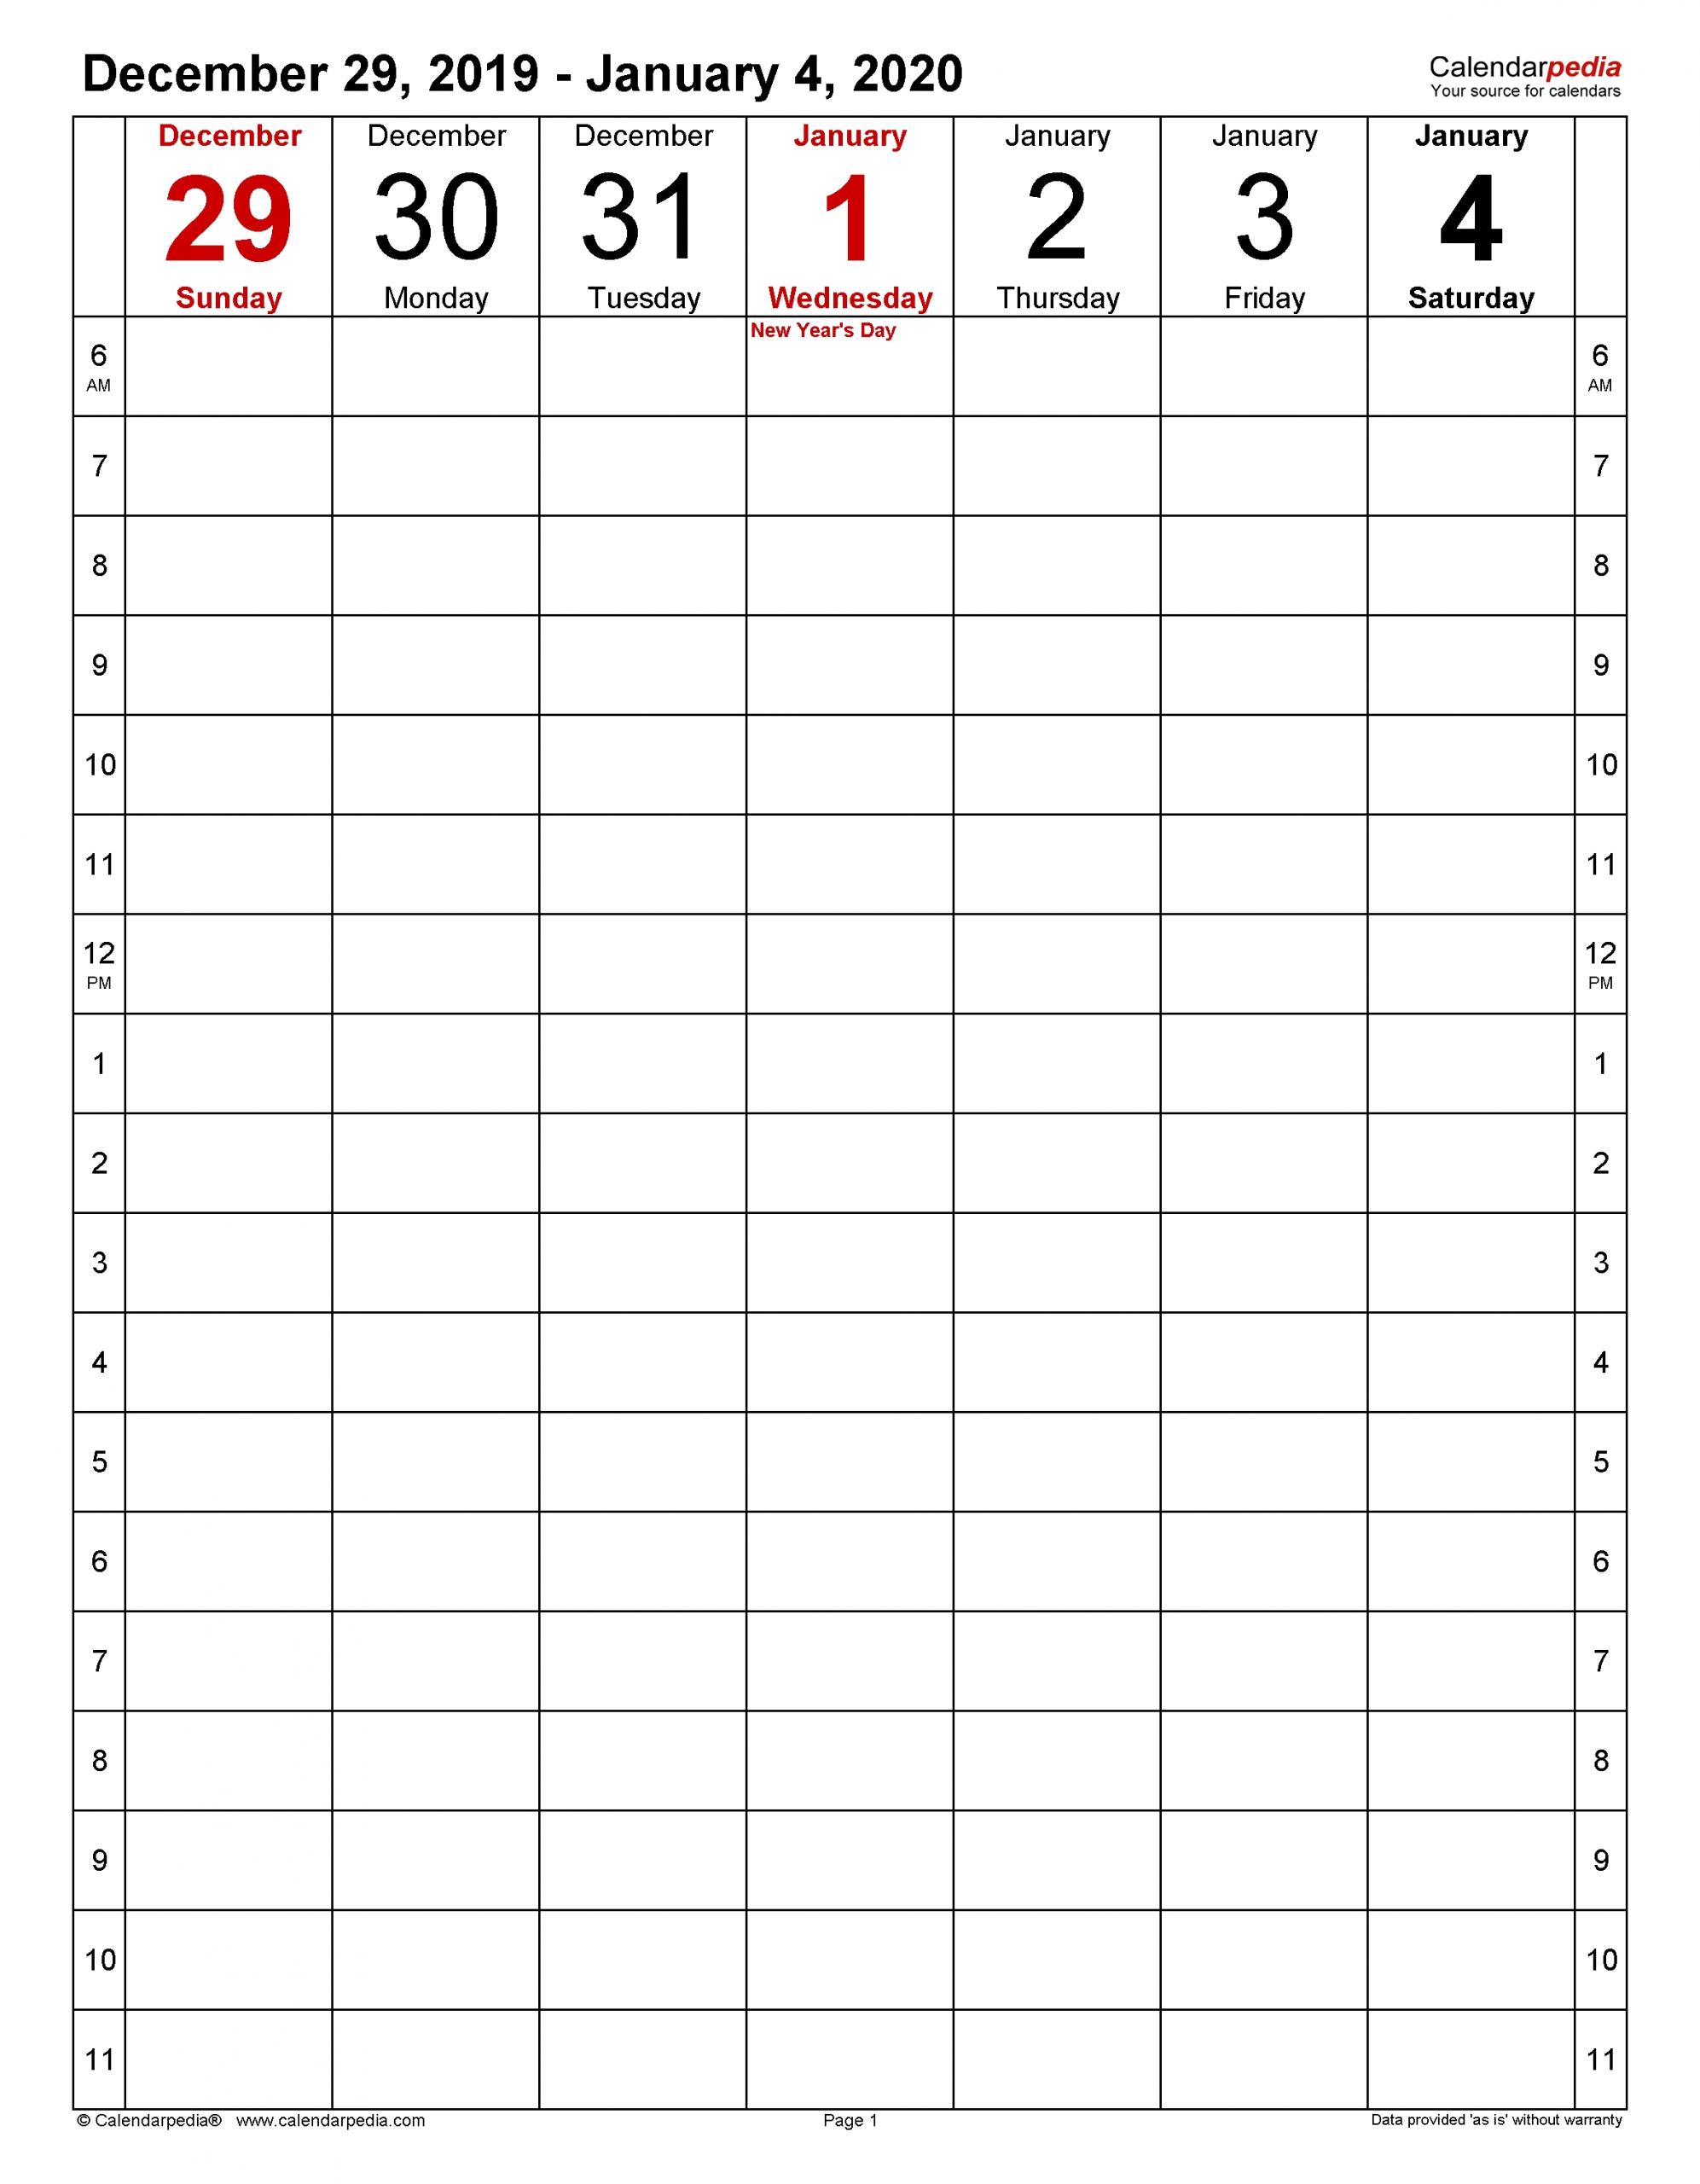 Weekly Calendars 2020 For Word - 12 Free Printable Templates  2020 Weekly Calendar